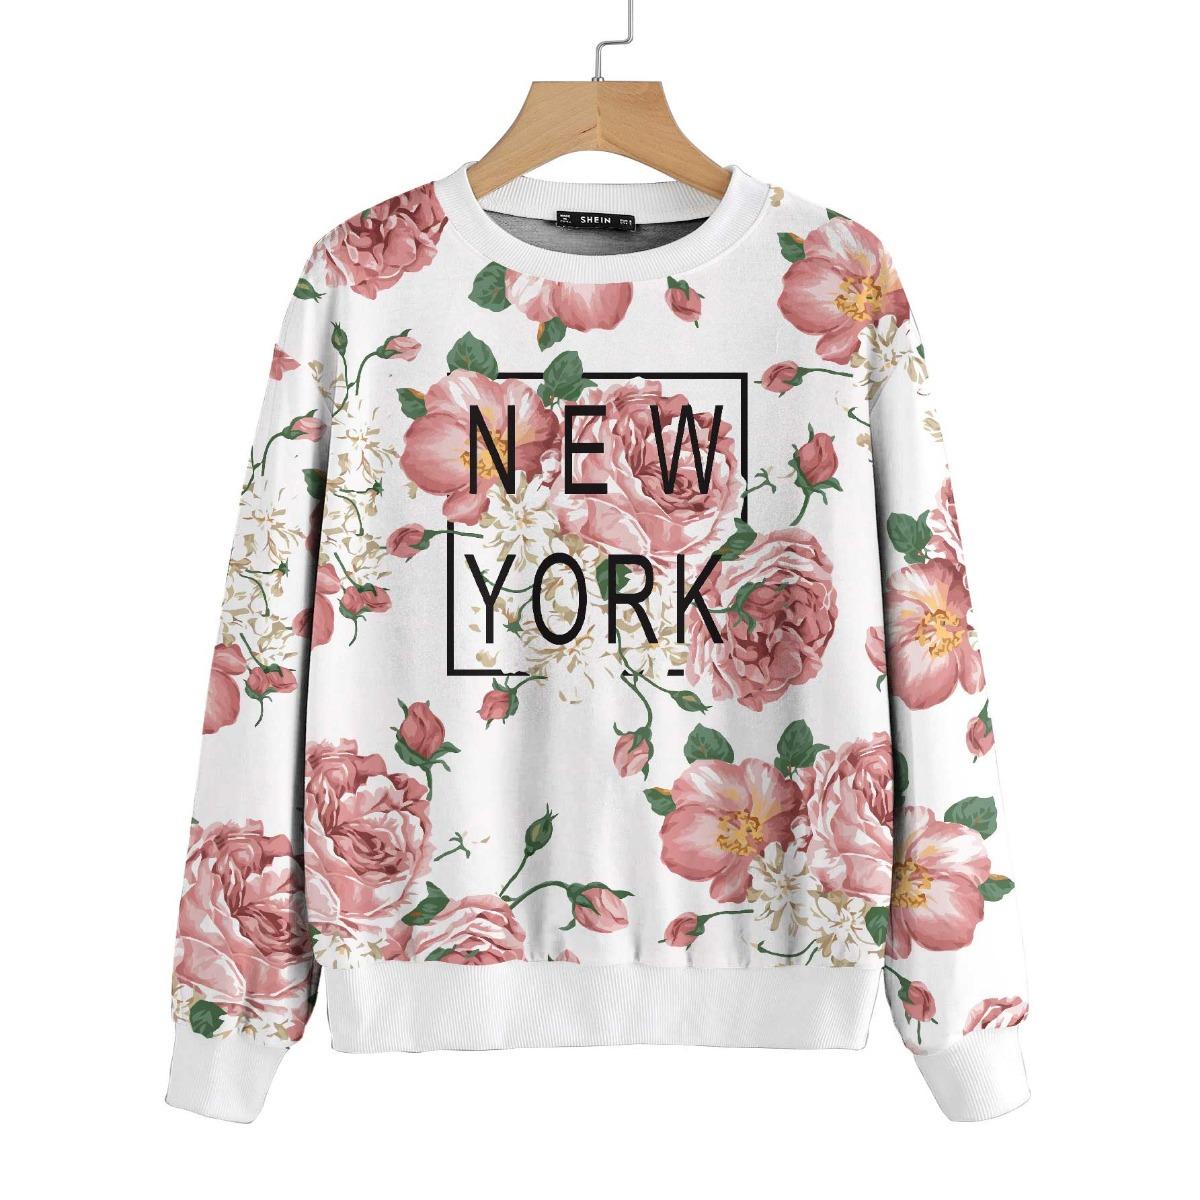 53941fb15c0 Blusa Feminina Moletom New York